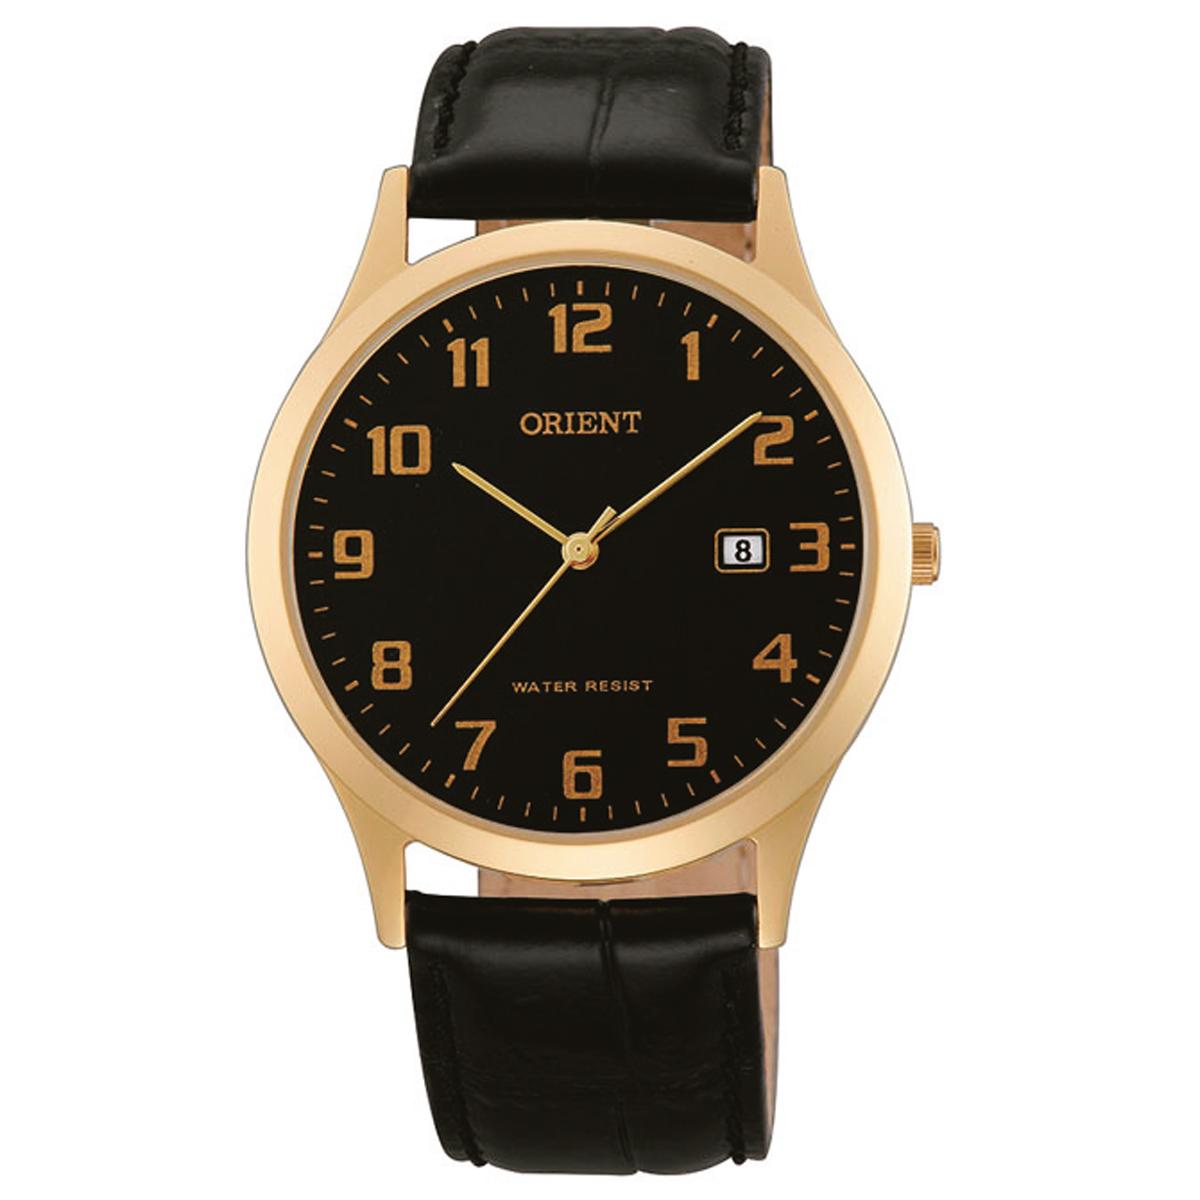 Orient Watch FUNA1002B0 Gold